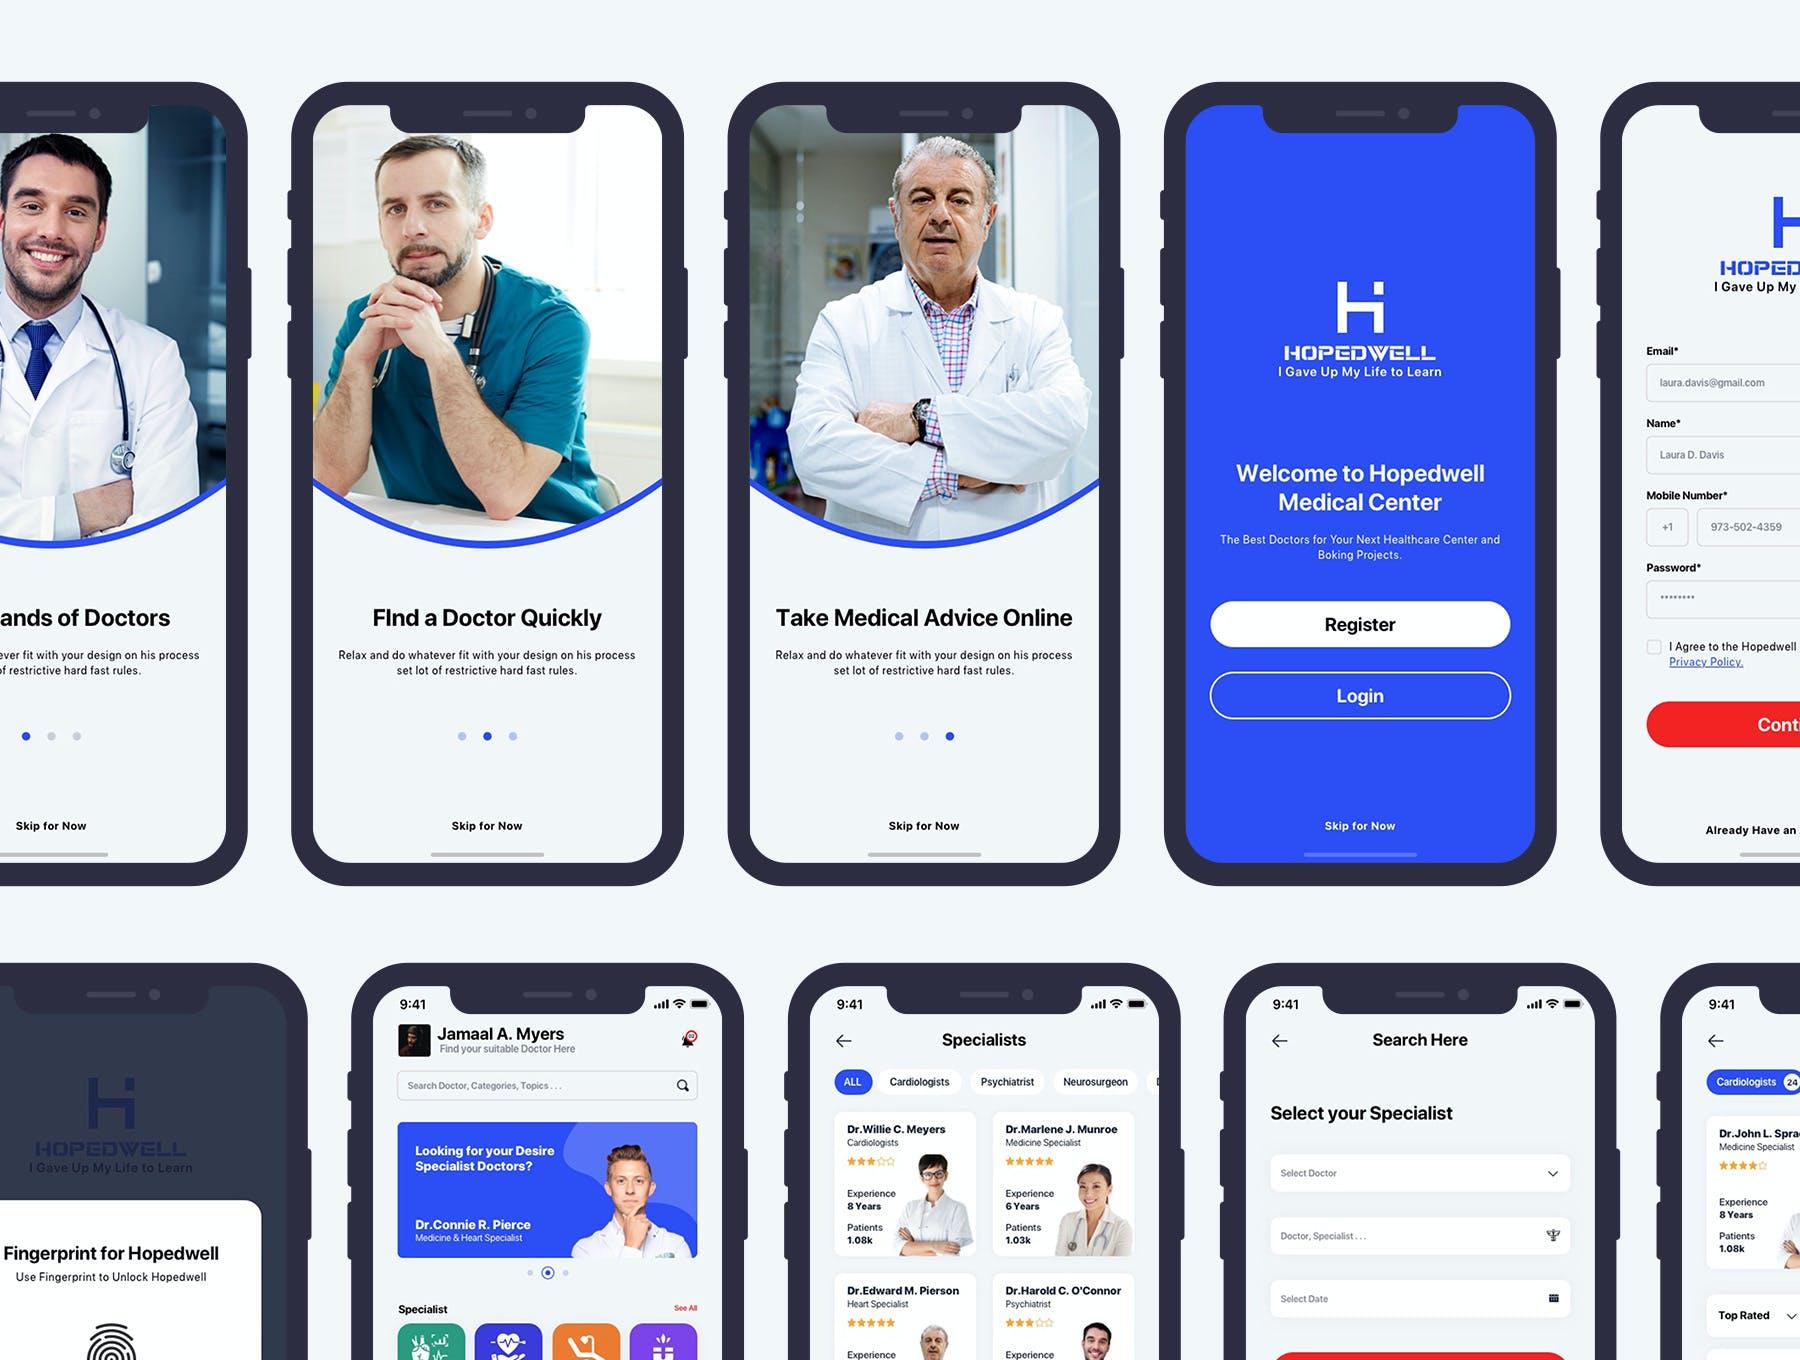 医院挂号卫生保健APP应用程序UI界面设计套件 Hospital & HealthCare Mobile App UI插图4